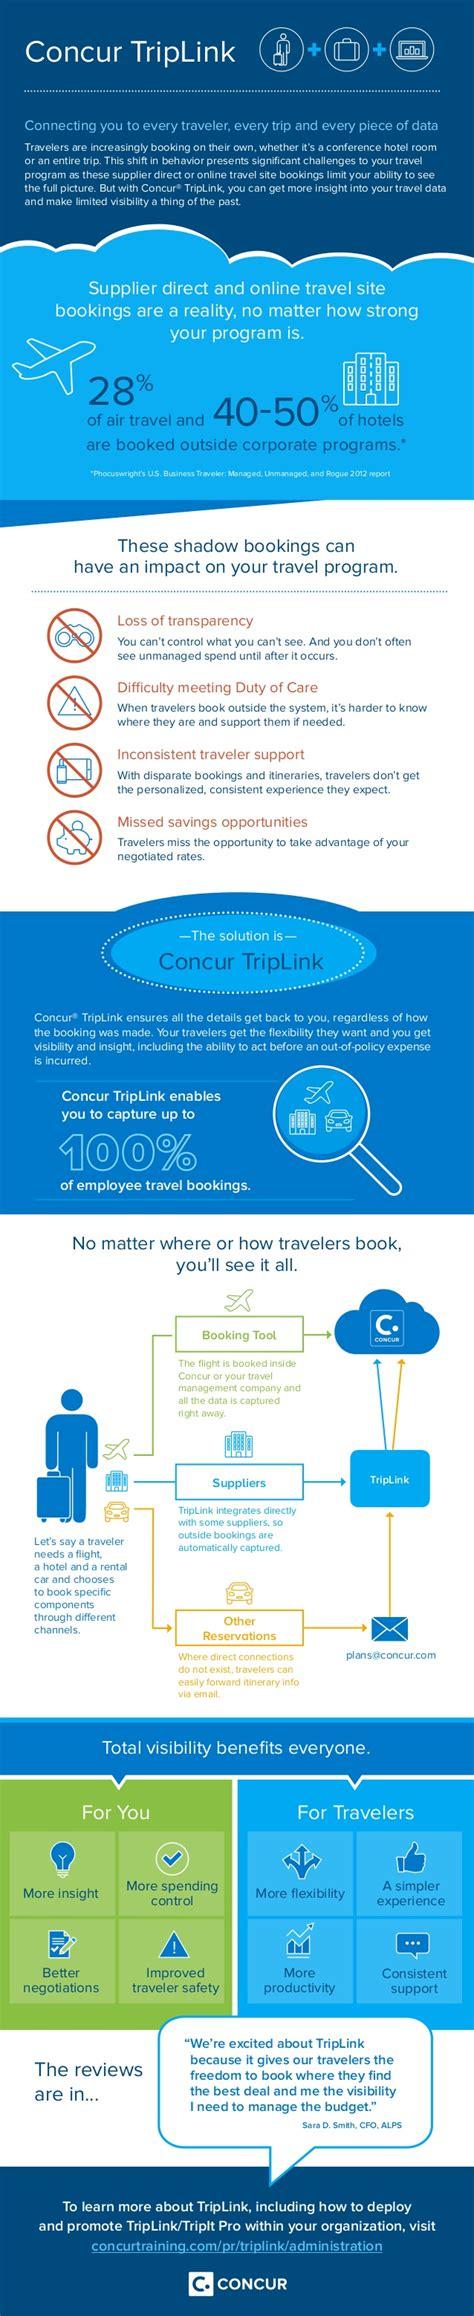 upcoming slideshare how to deploy concur triplink